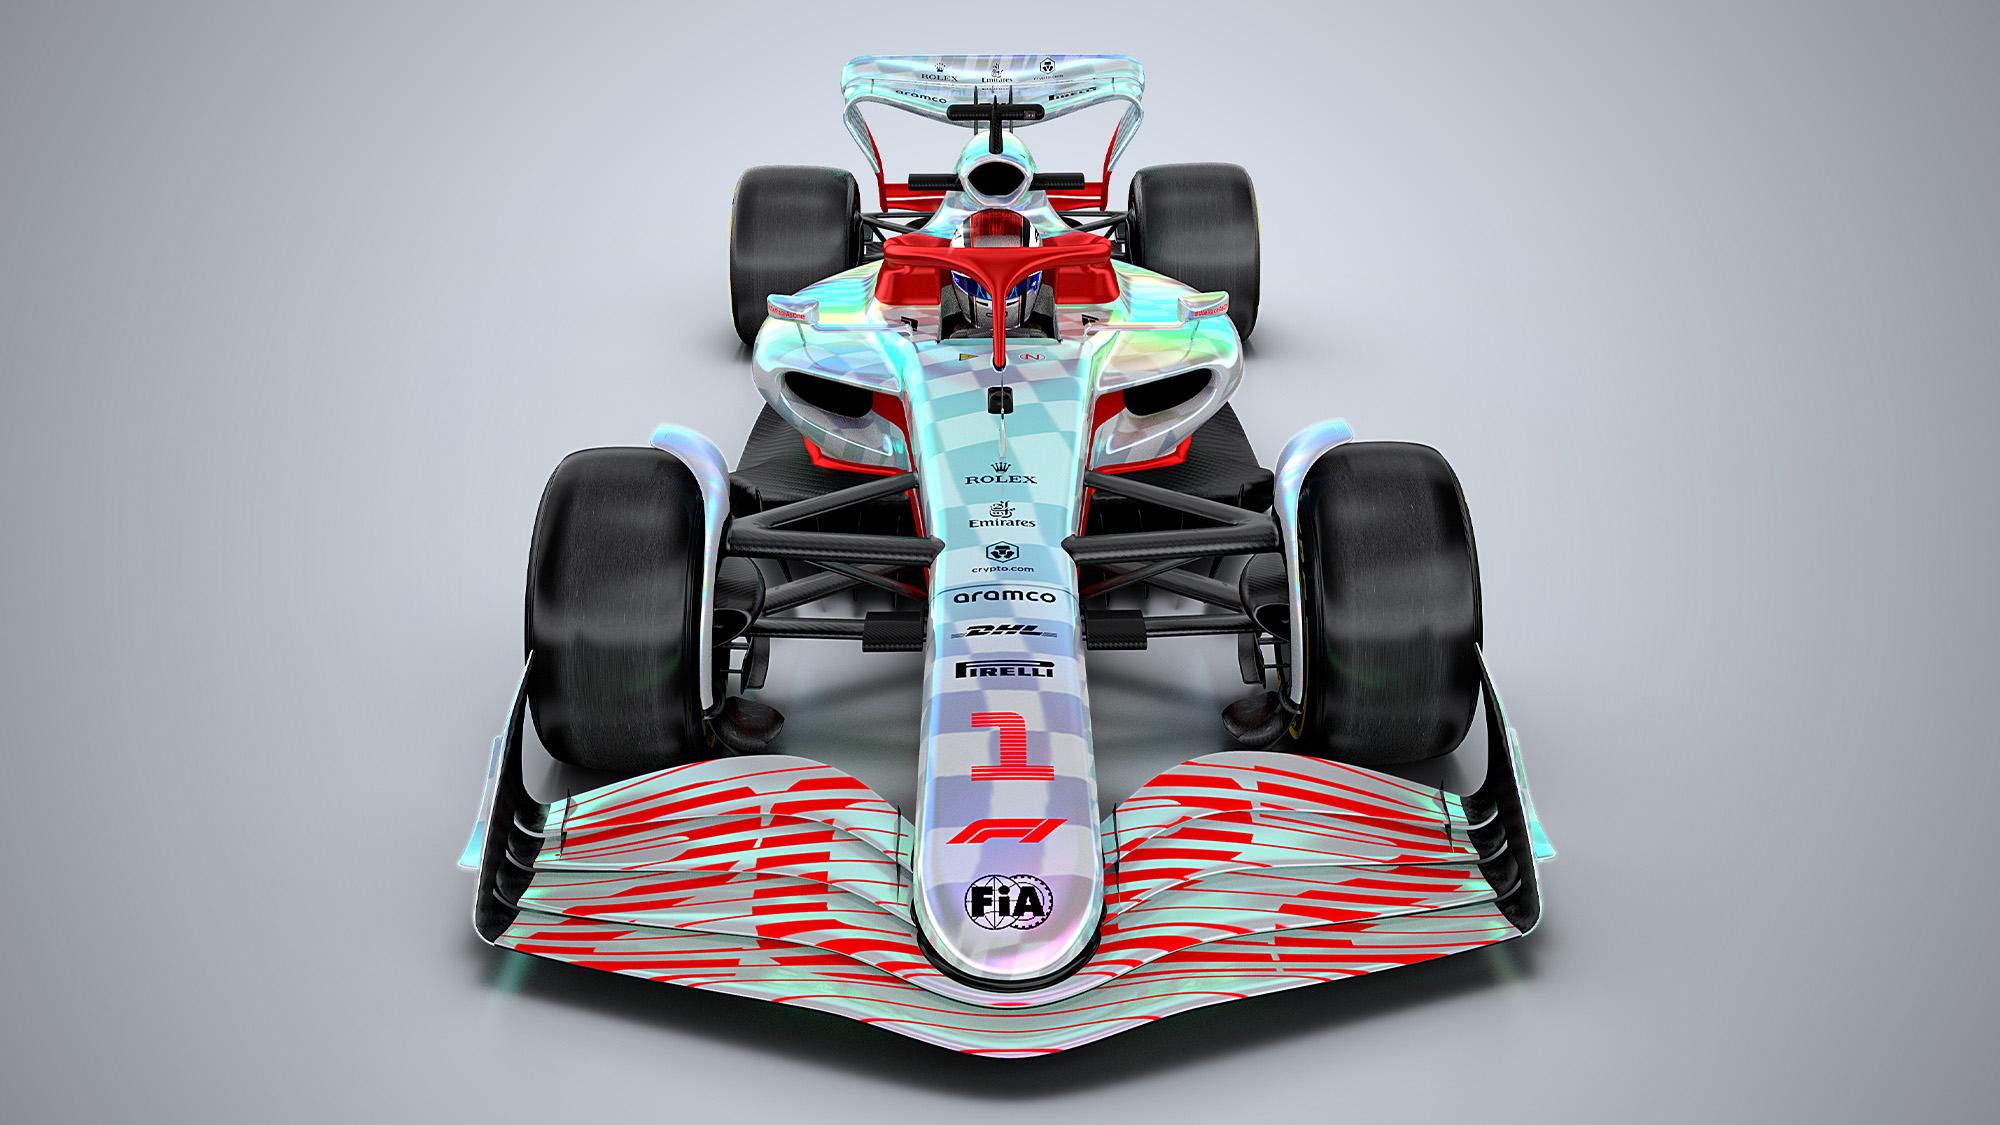 F1 2022 car render overhead